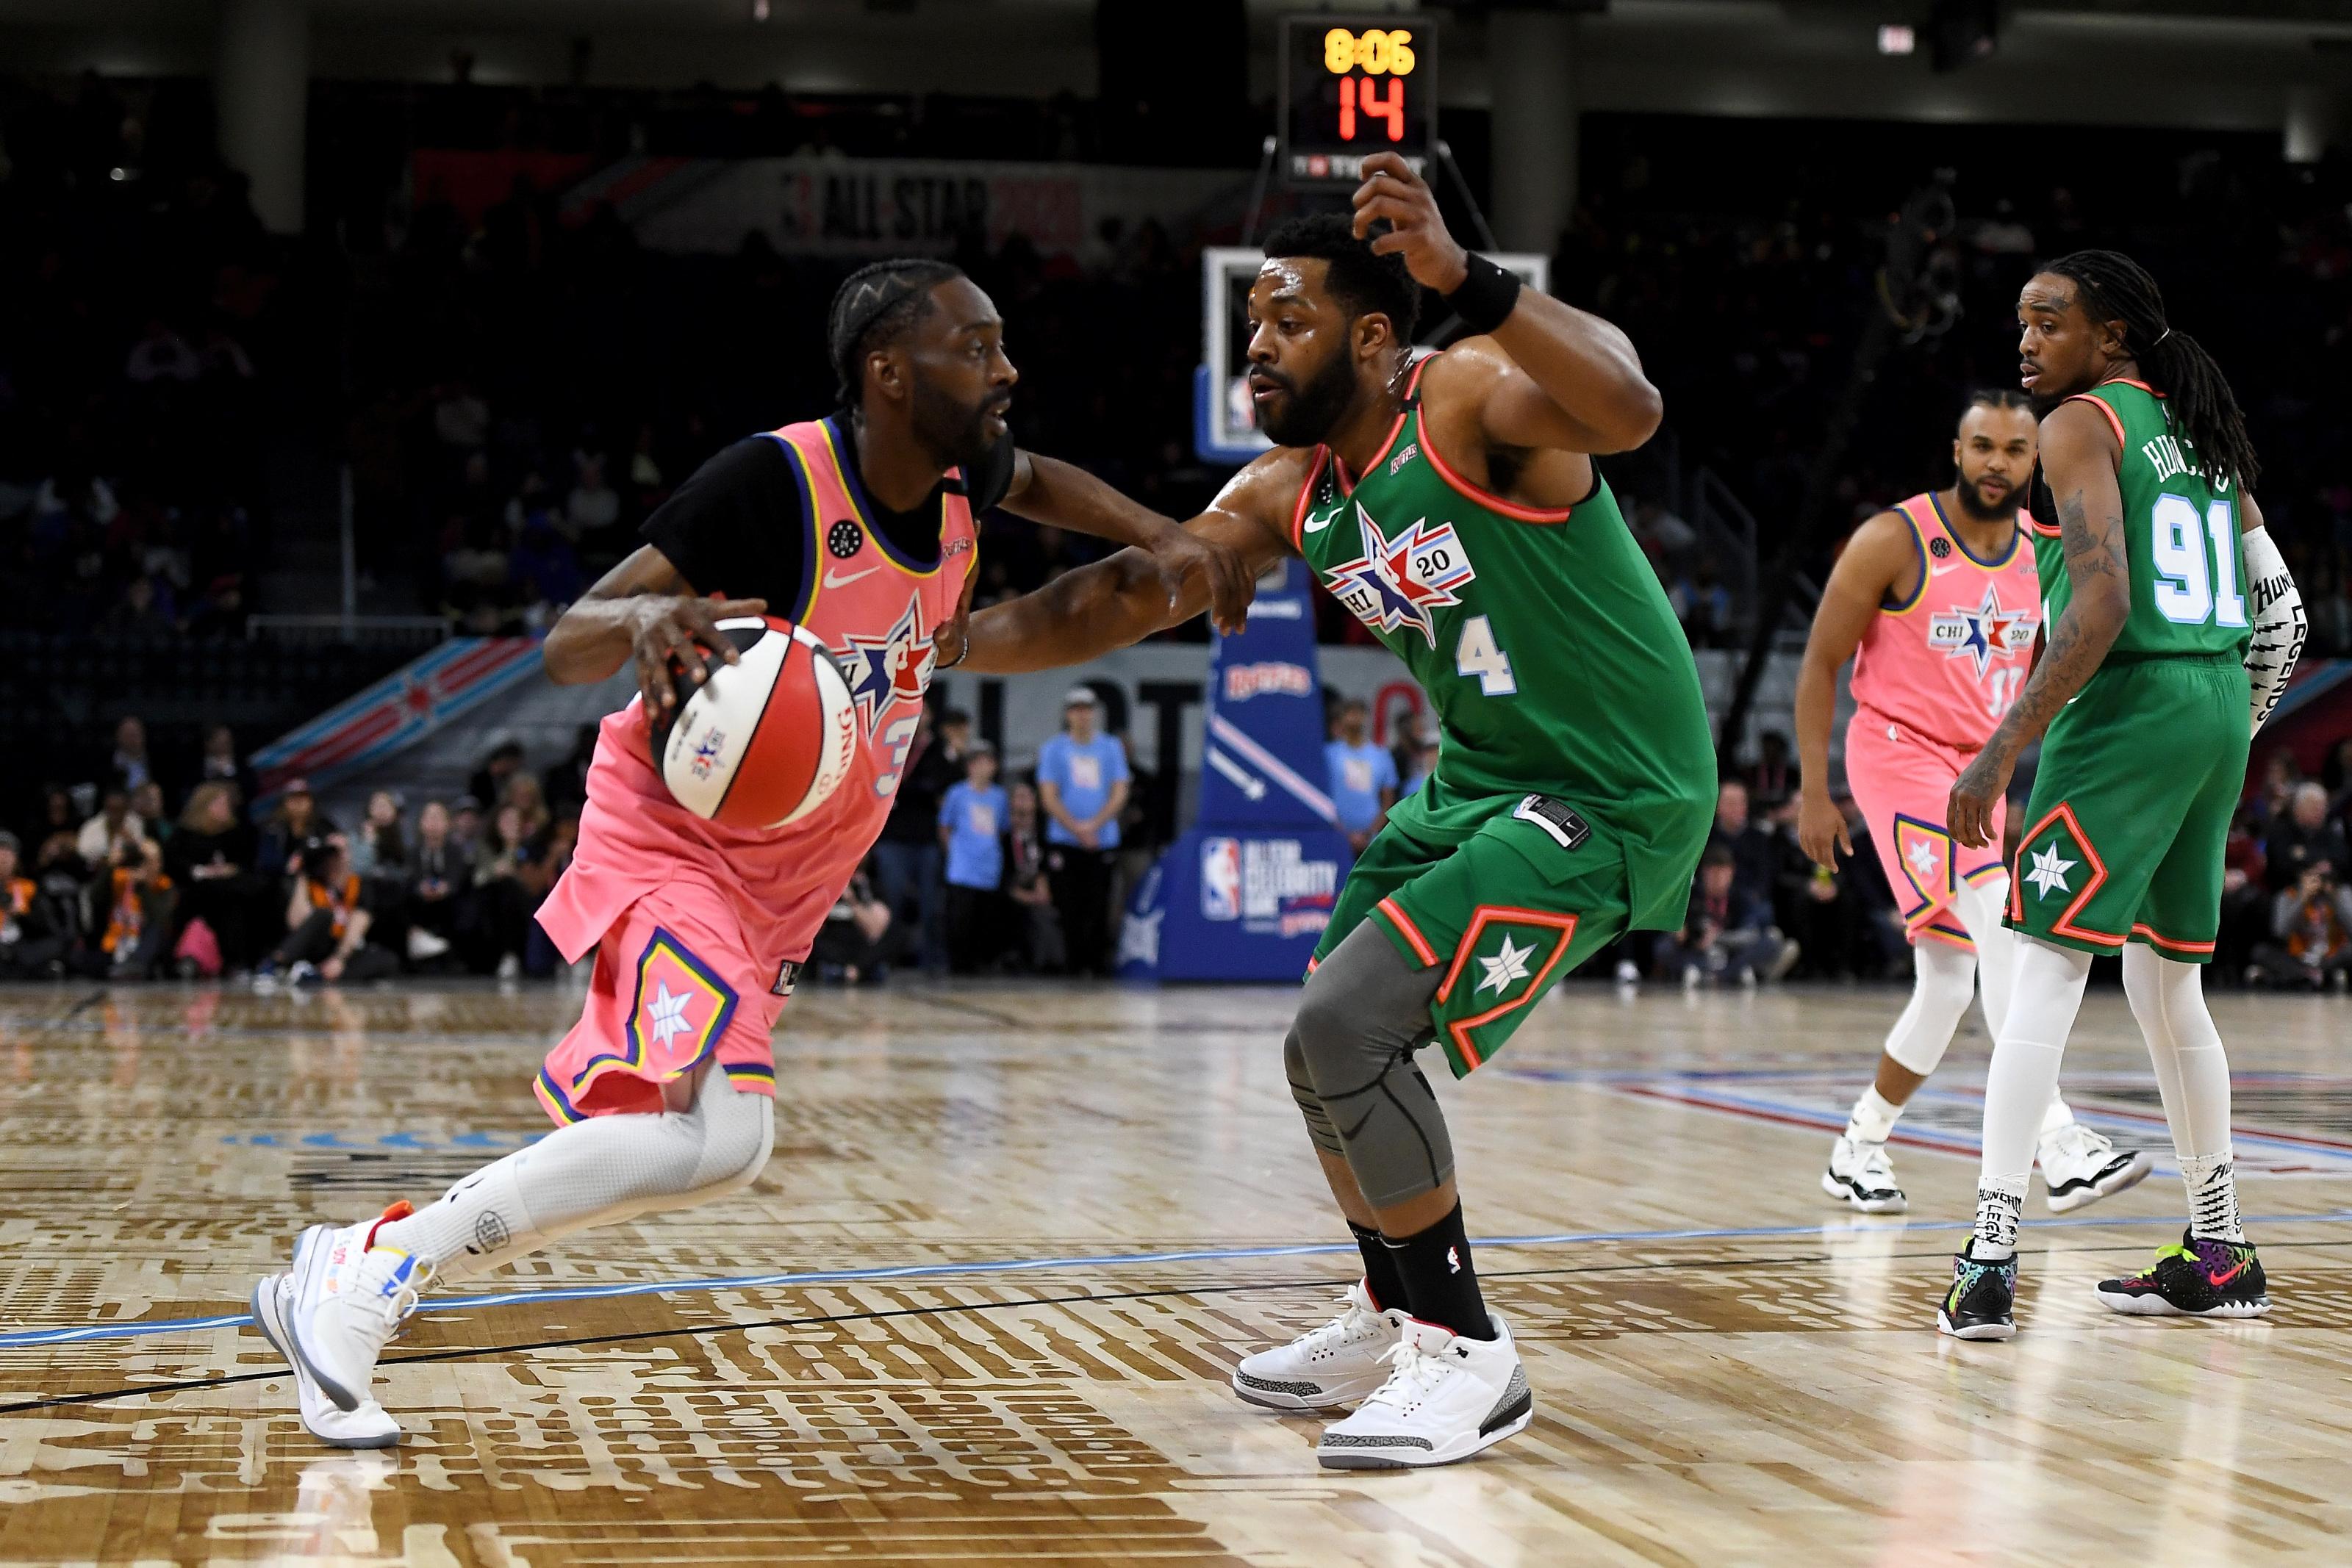 Watch Chicago PD's LaRoyce Hawkins NBA All-Star Celebrity ...